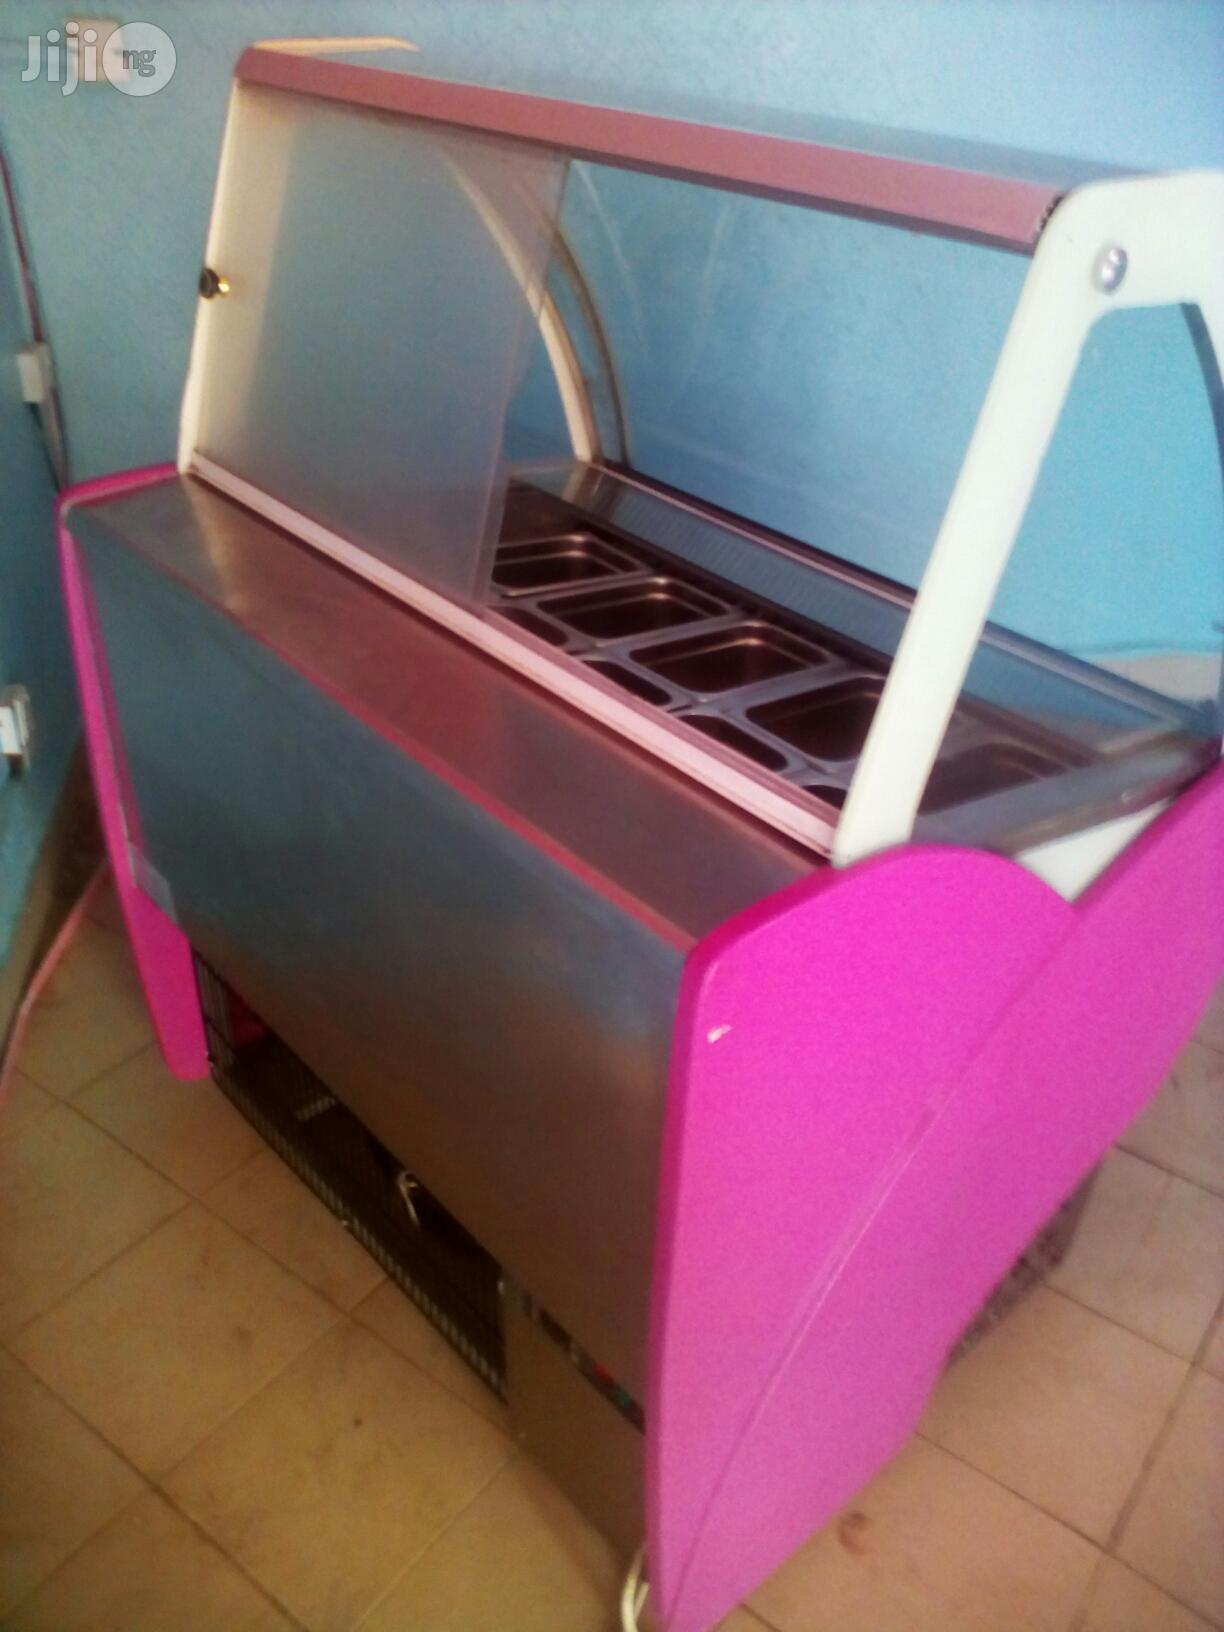 Ice Cream Display Freezer | Store Equipment for sale in Ojo, Lagos State, Nigeria